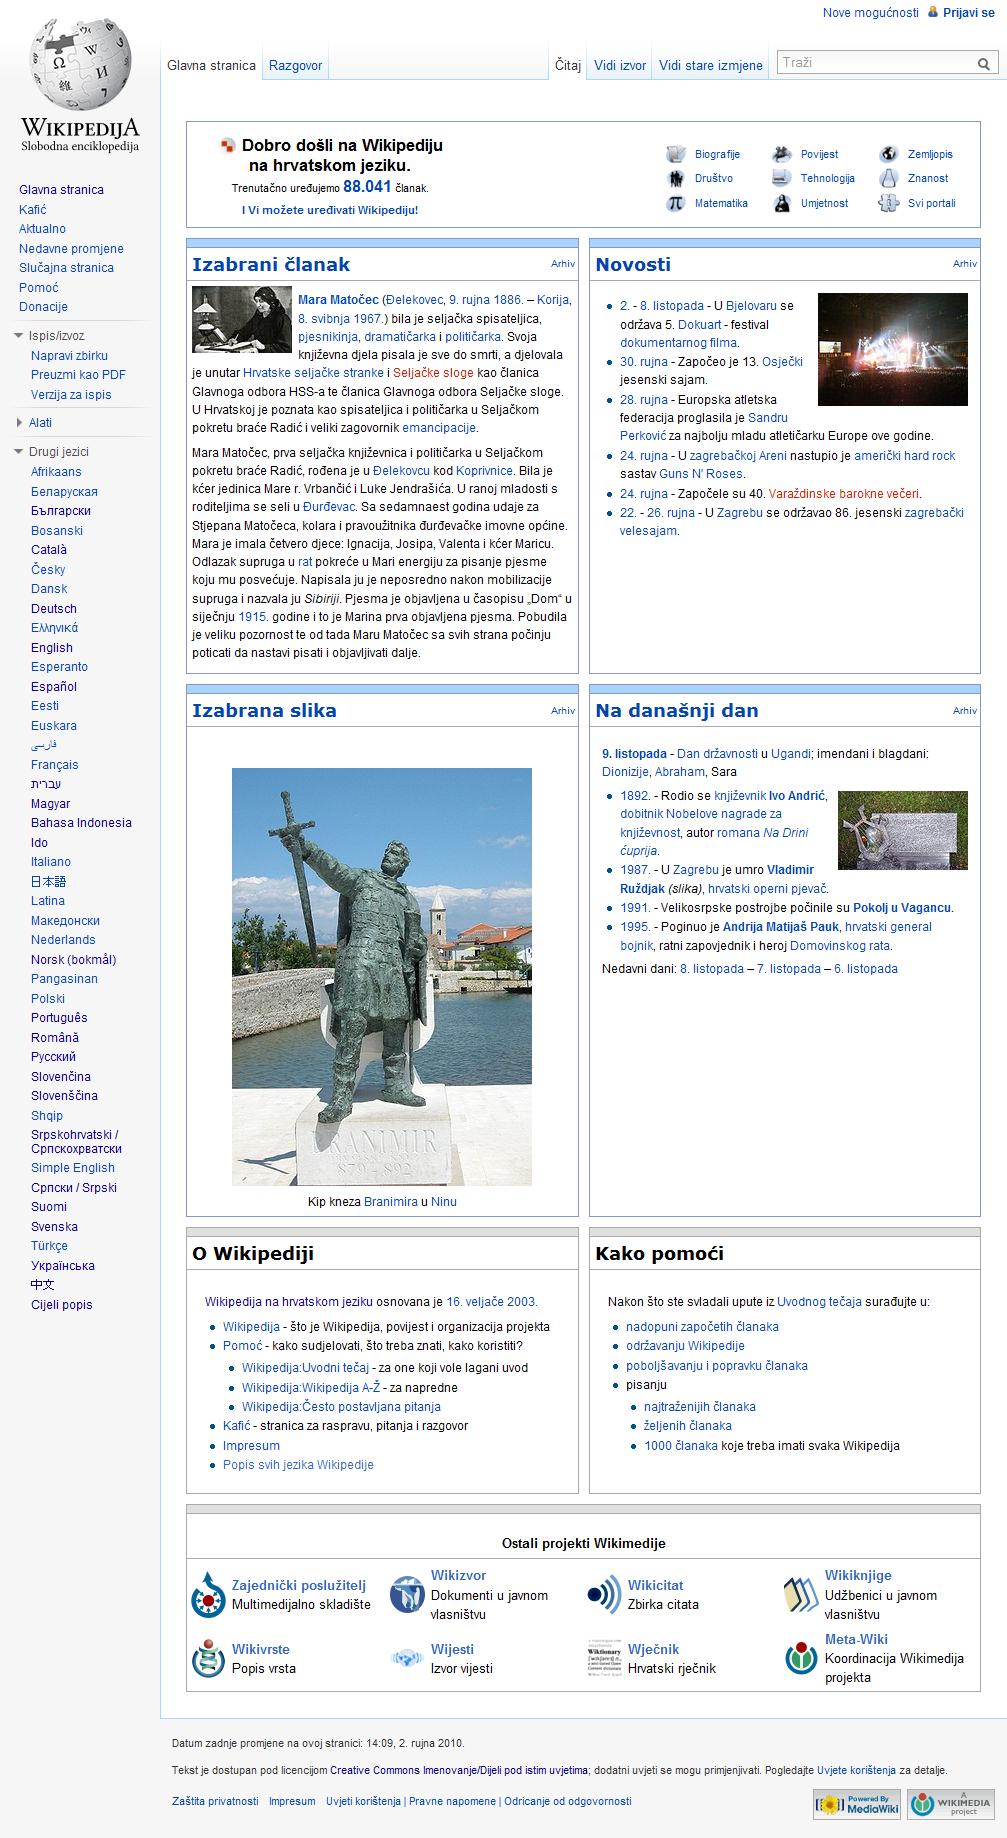 Croatian Wikipedia Wikidata